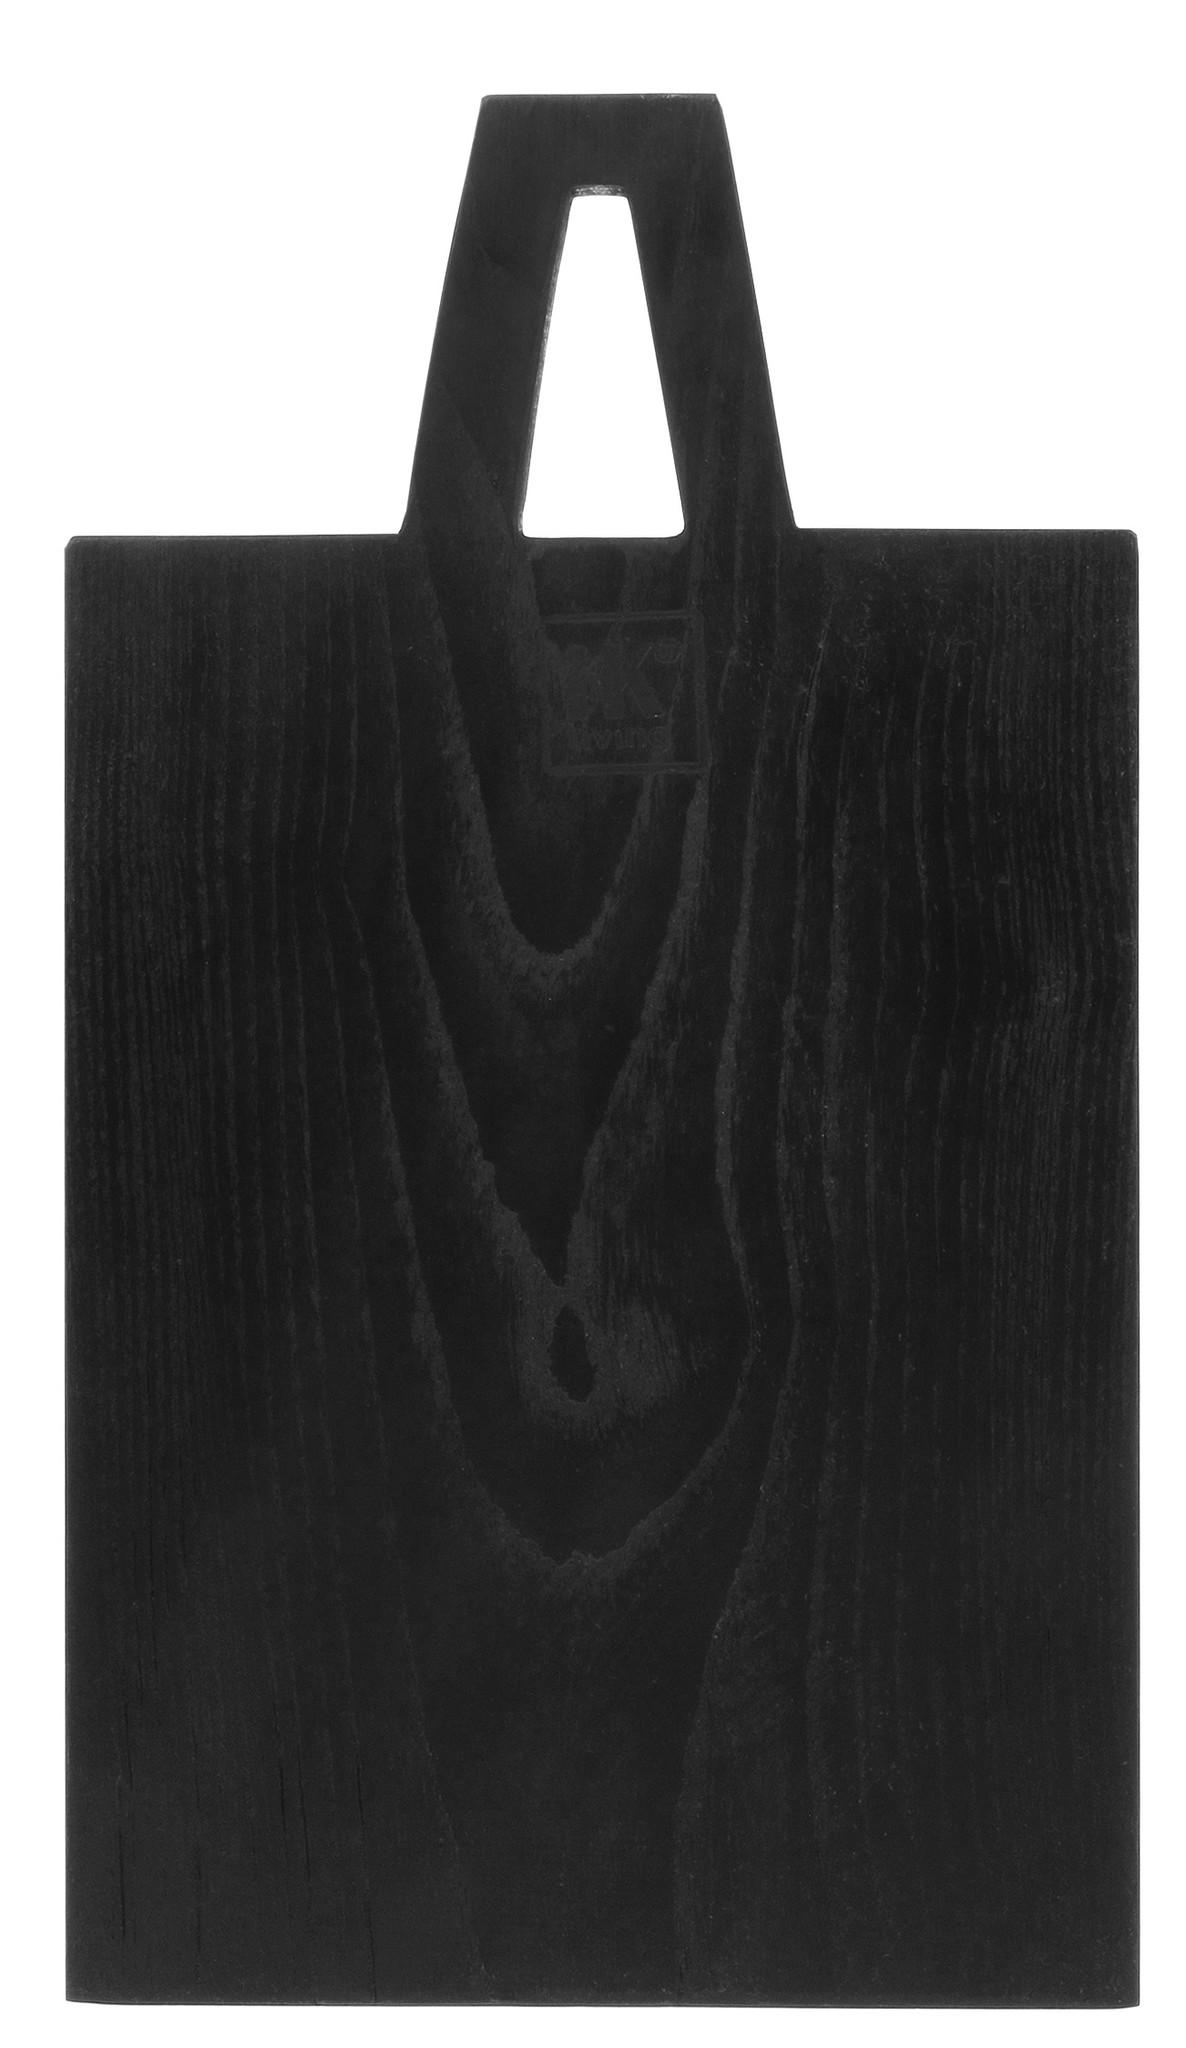 Broodplank Square S 30x17cm Black-1